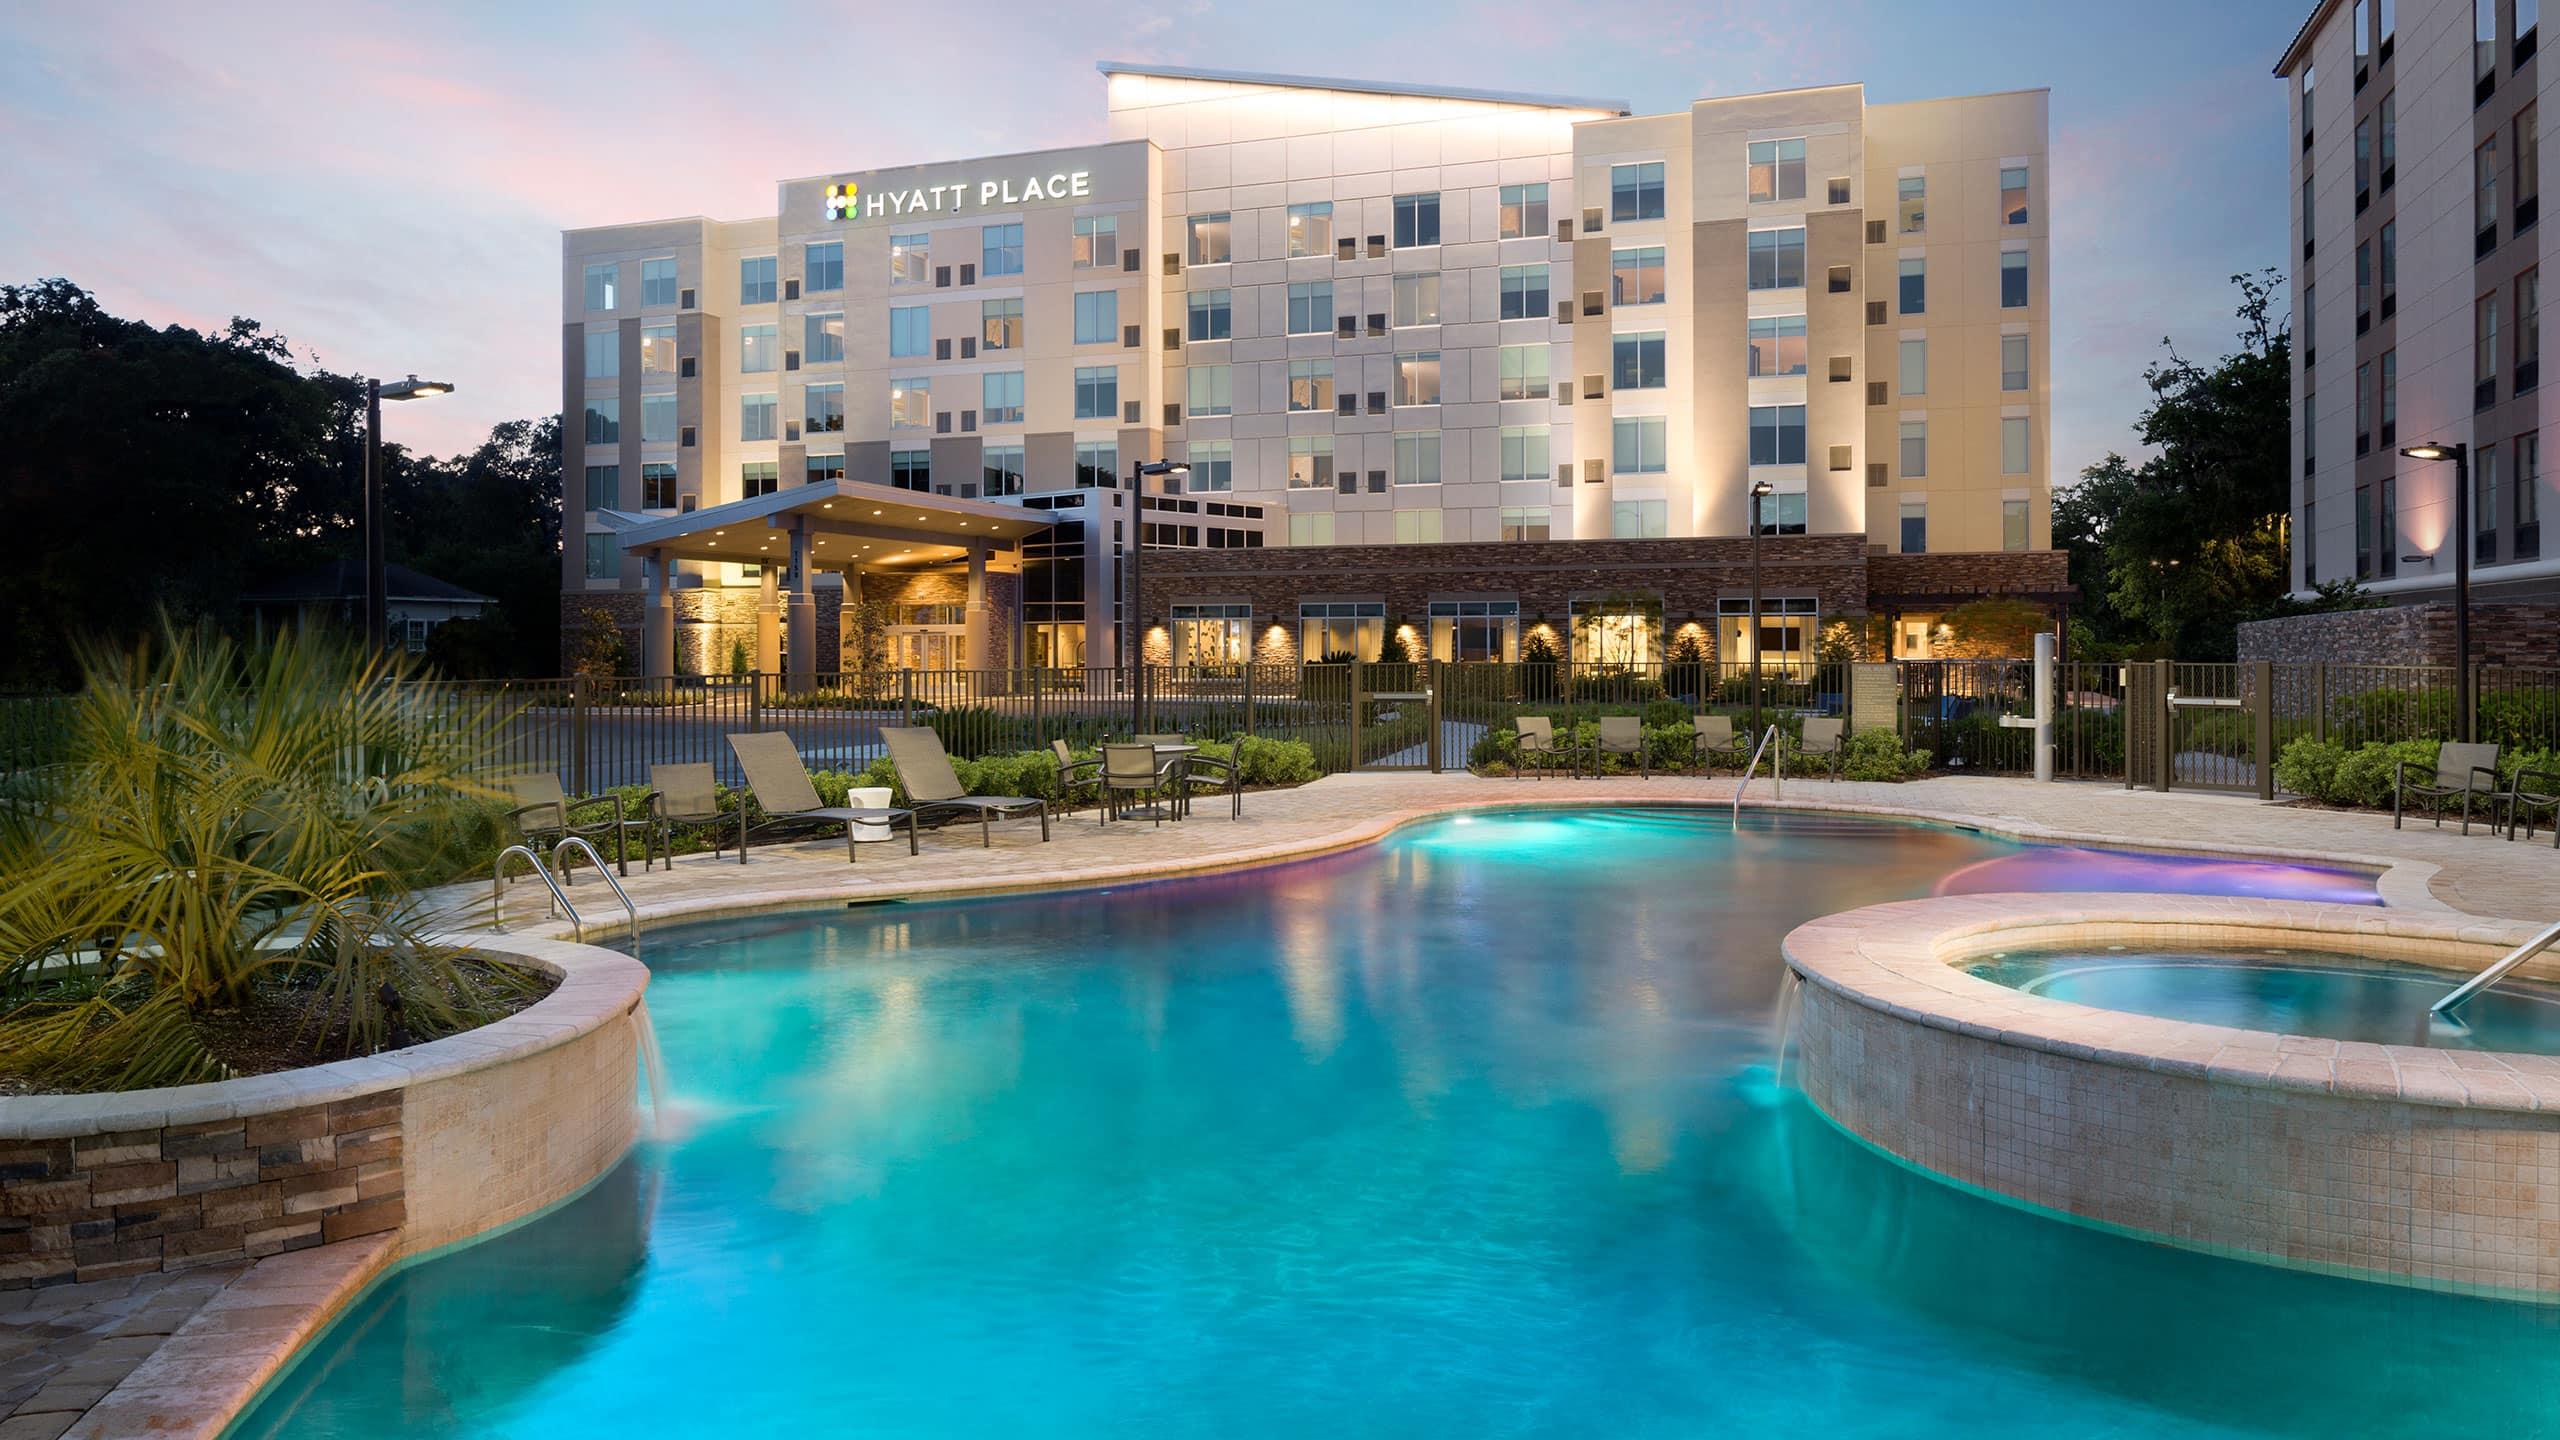 Biloxi Gulf Coast Hotel Hyatt Place Biloxi